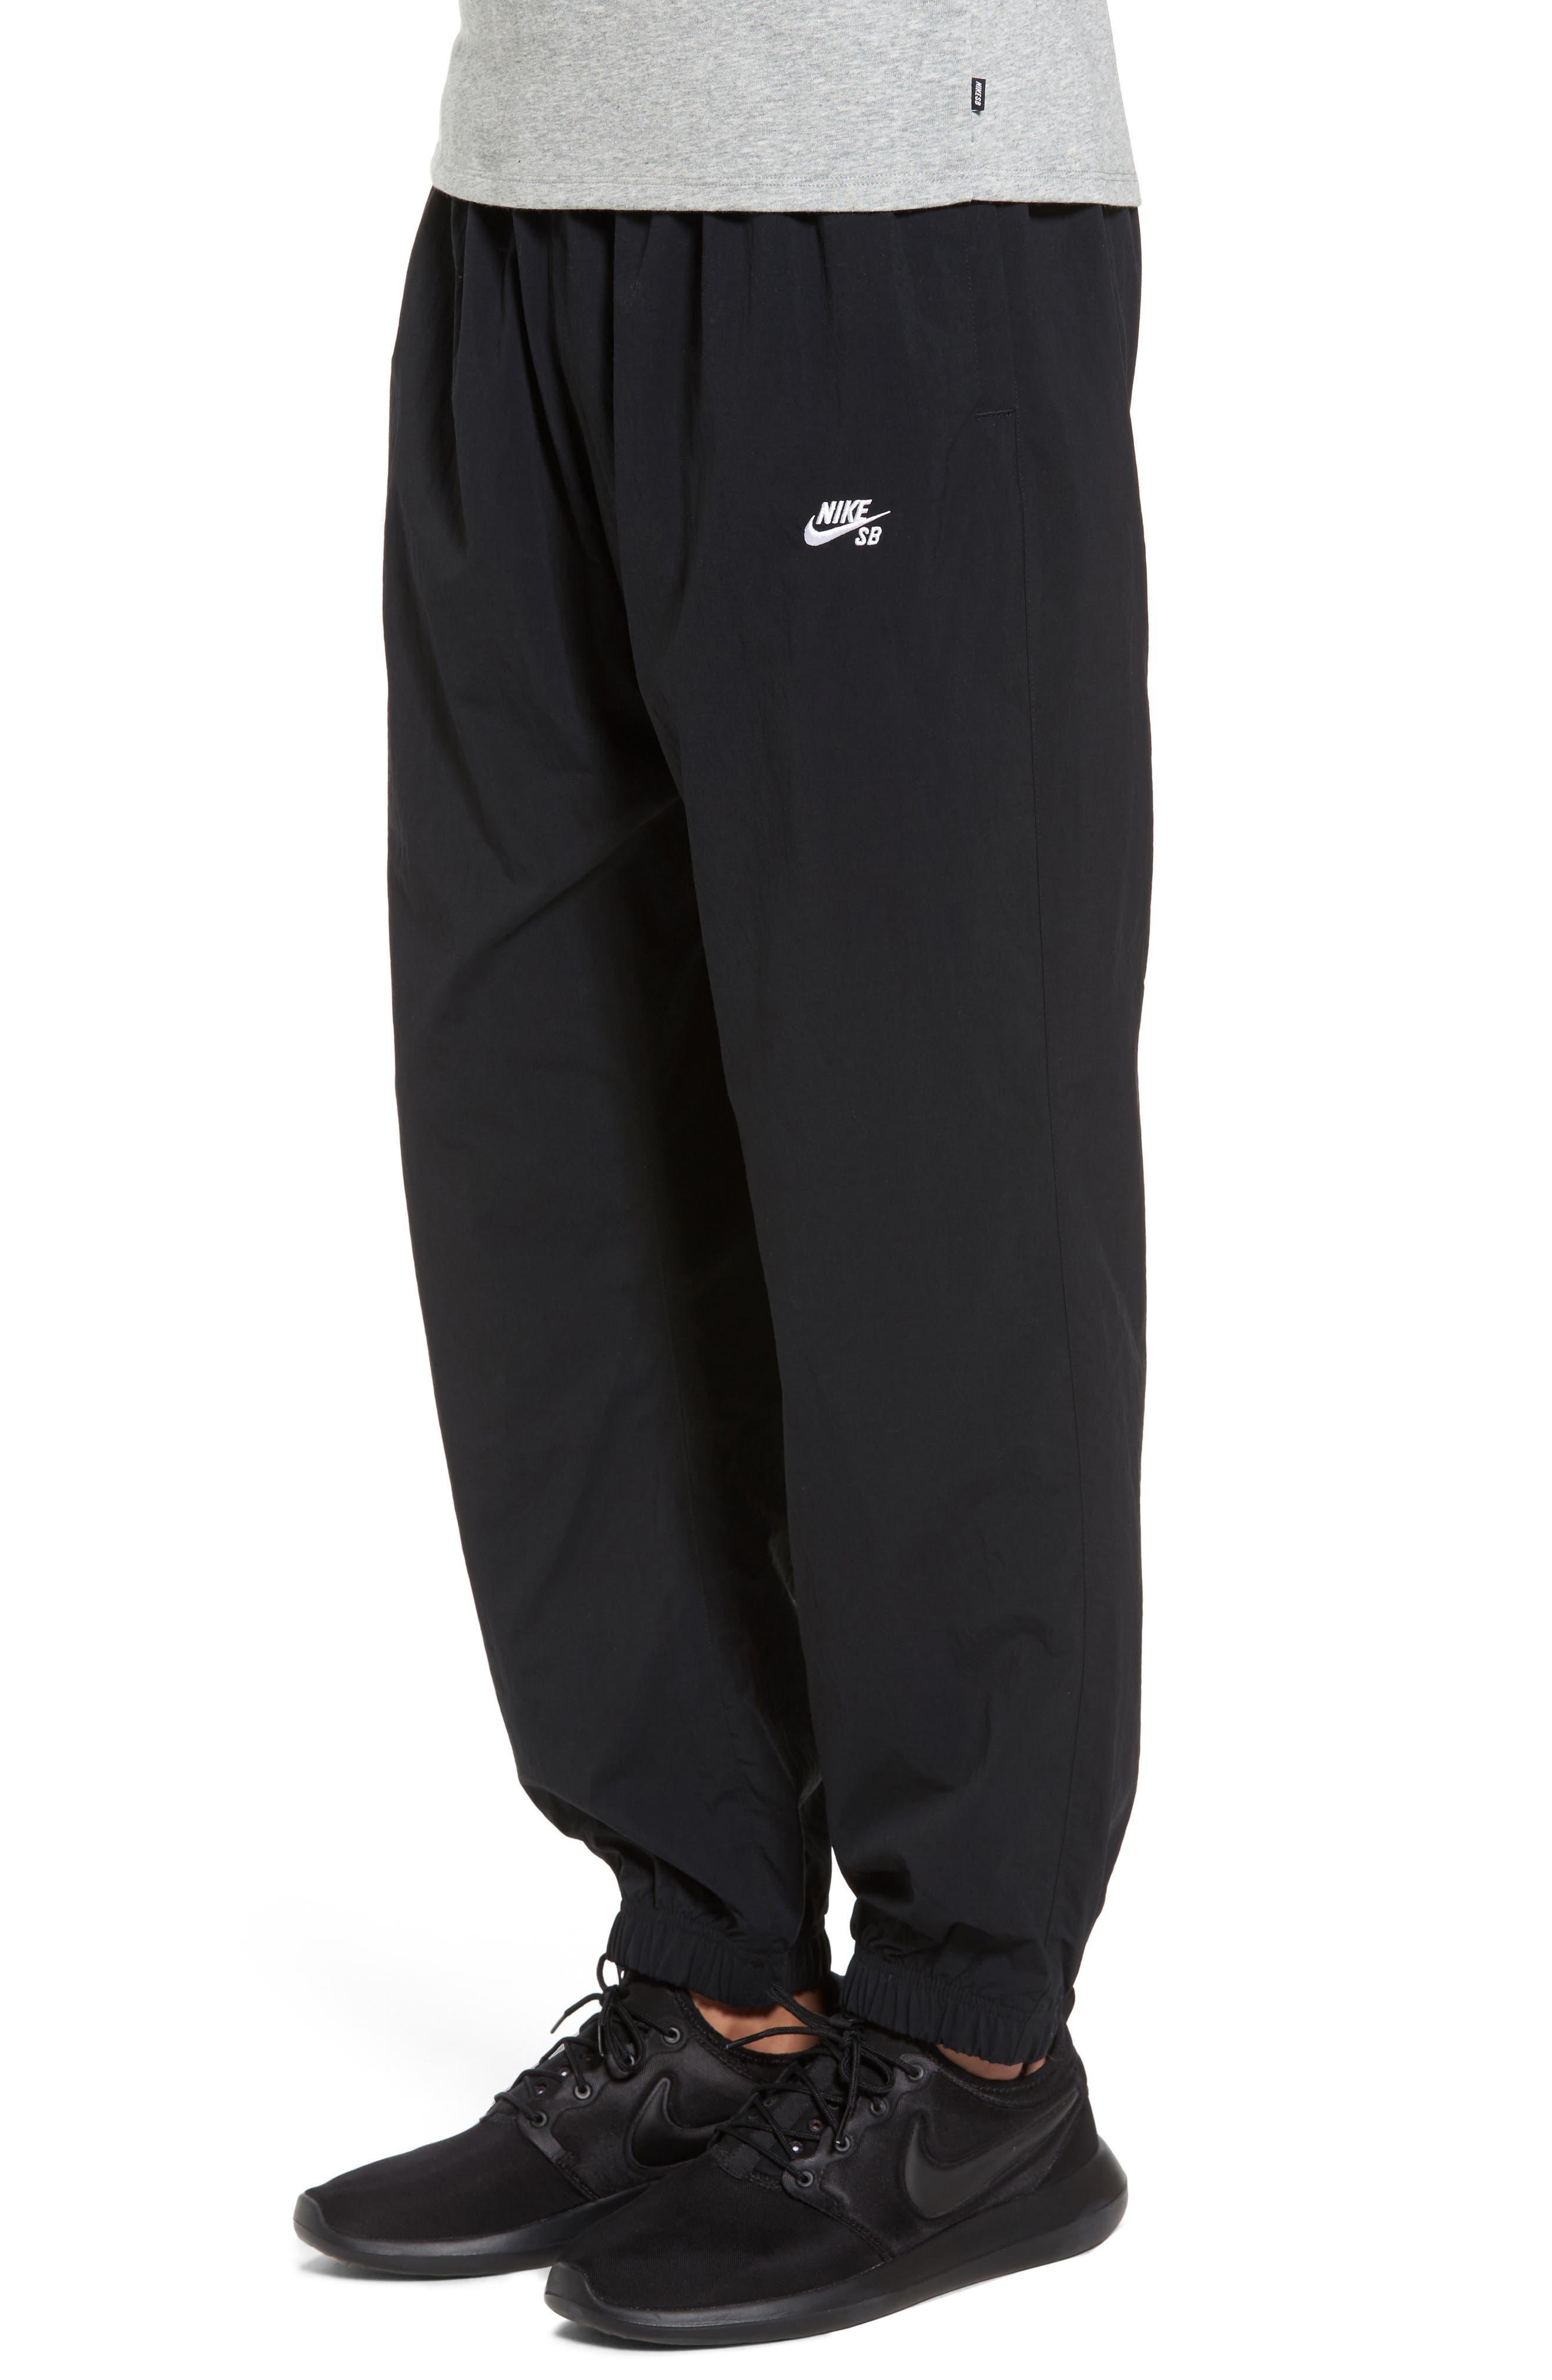 Flex Woven Pants,                             Alternate thumbnail 3, color,                             Black/ White